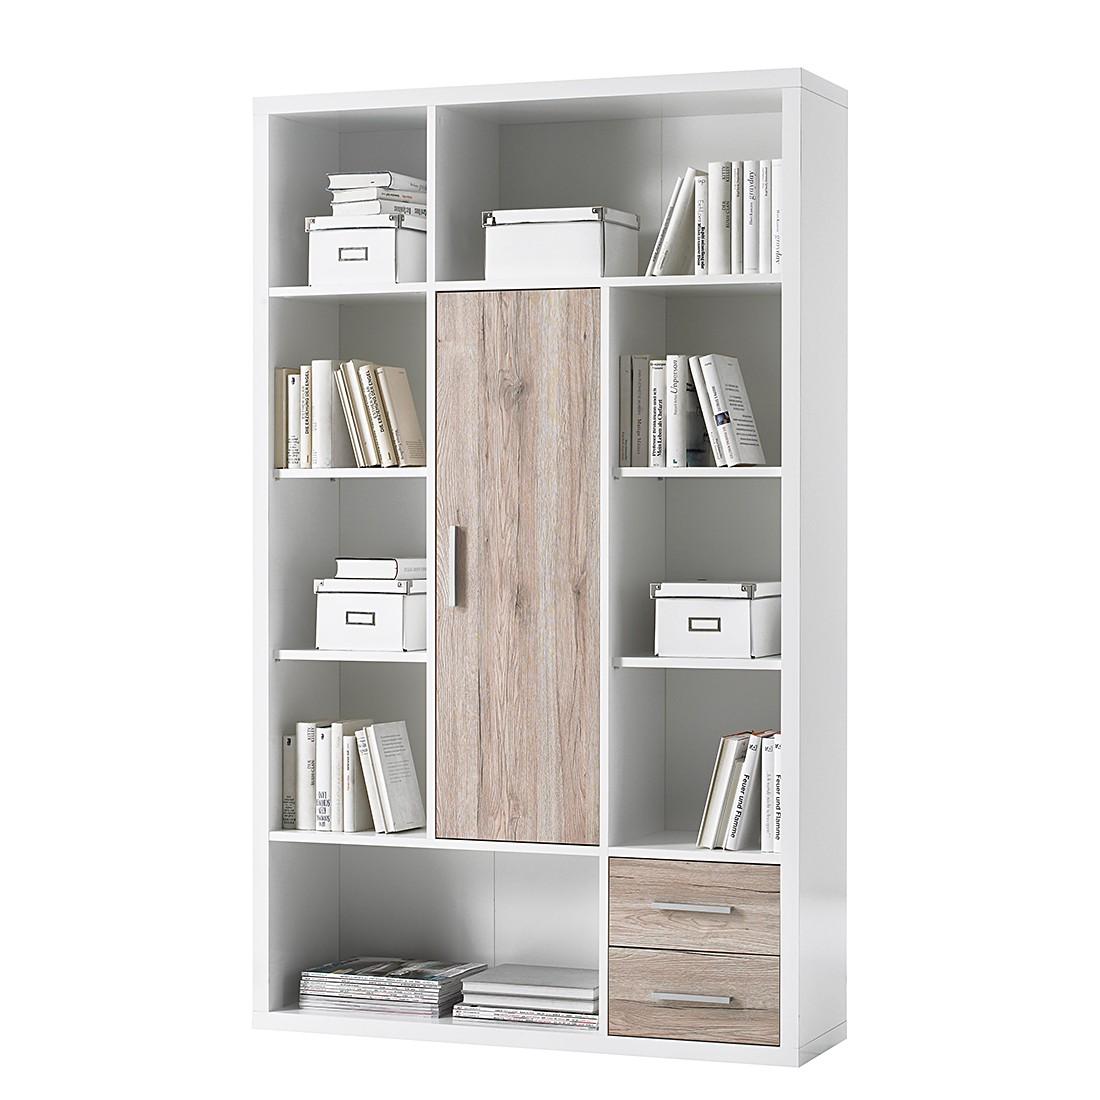 etag re nestor ii blanc brillant imitation ch ne de san remo loftscape par loftscape chez. Black Bedroom Furniture Sets. Home Design Ideas